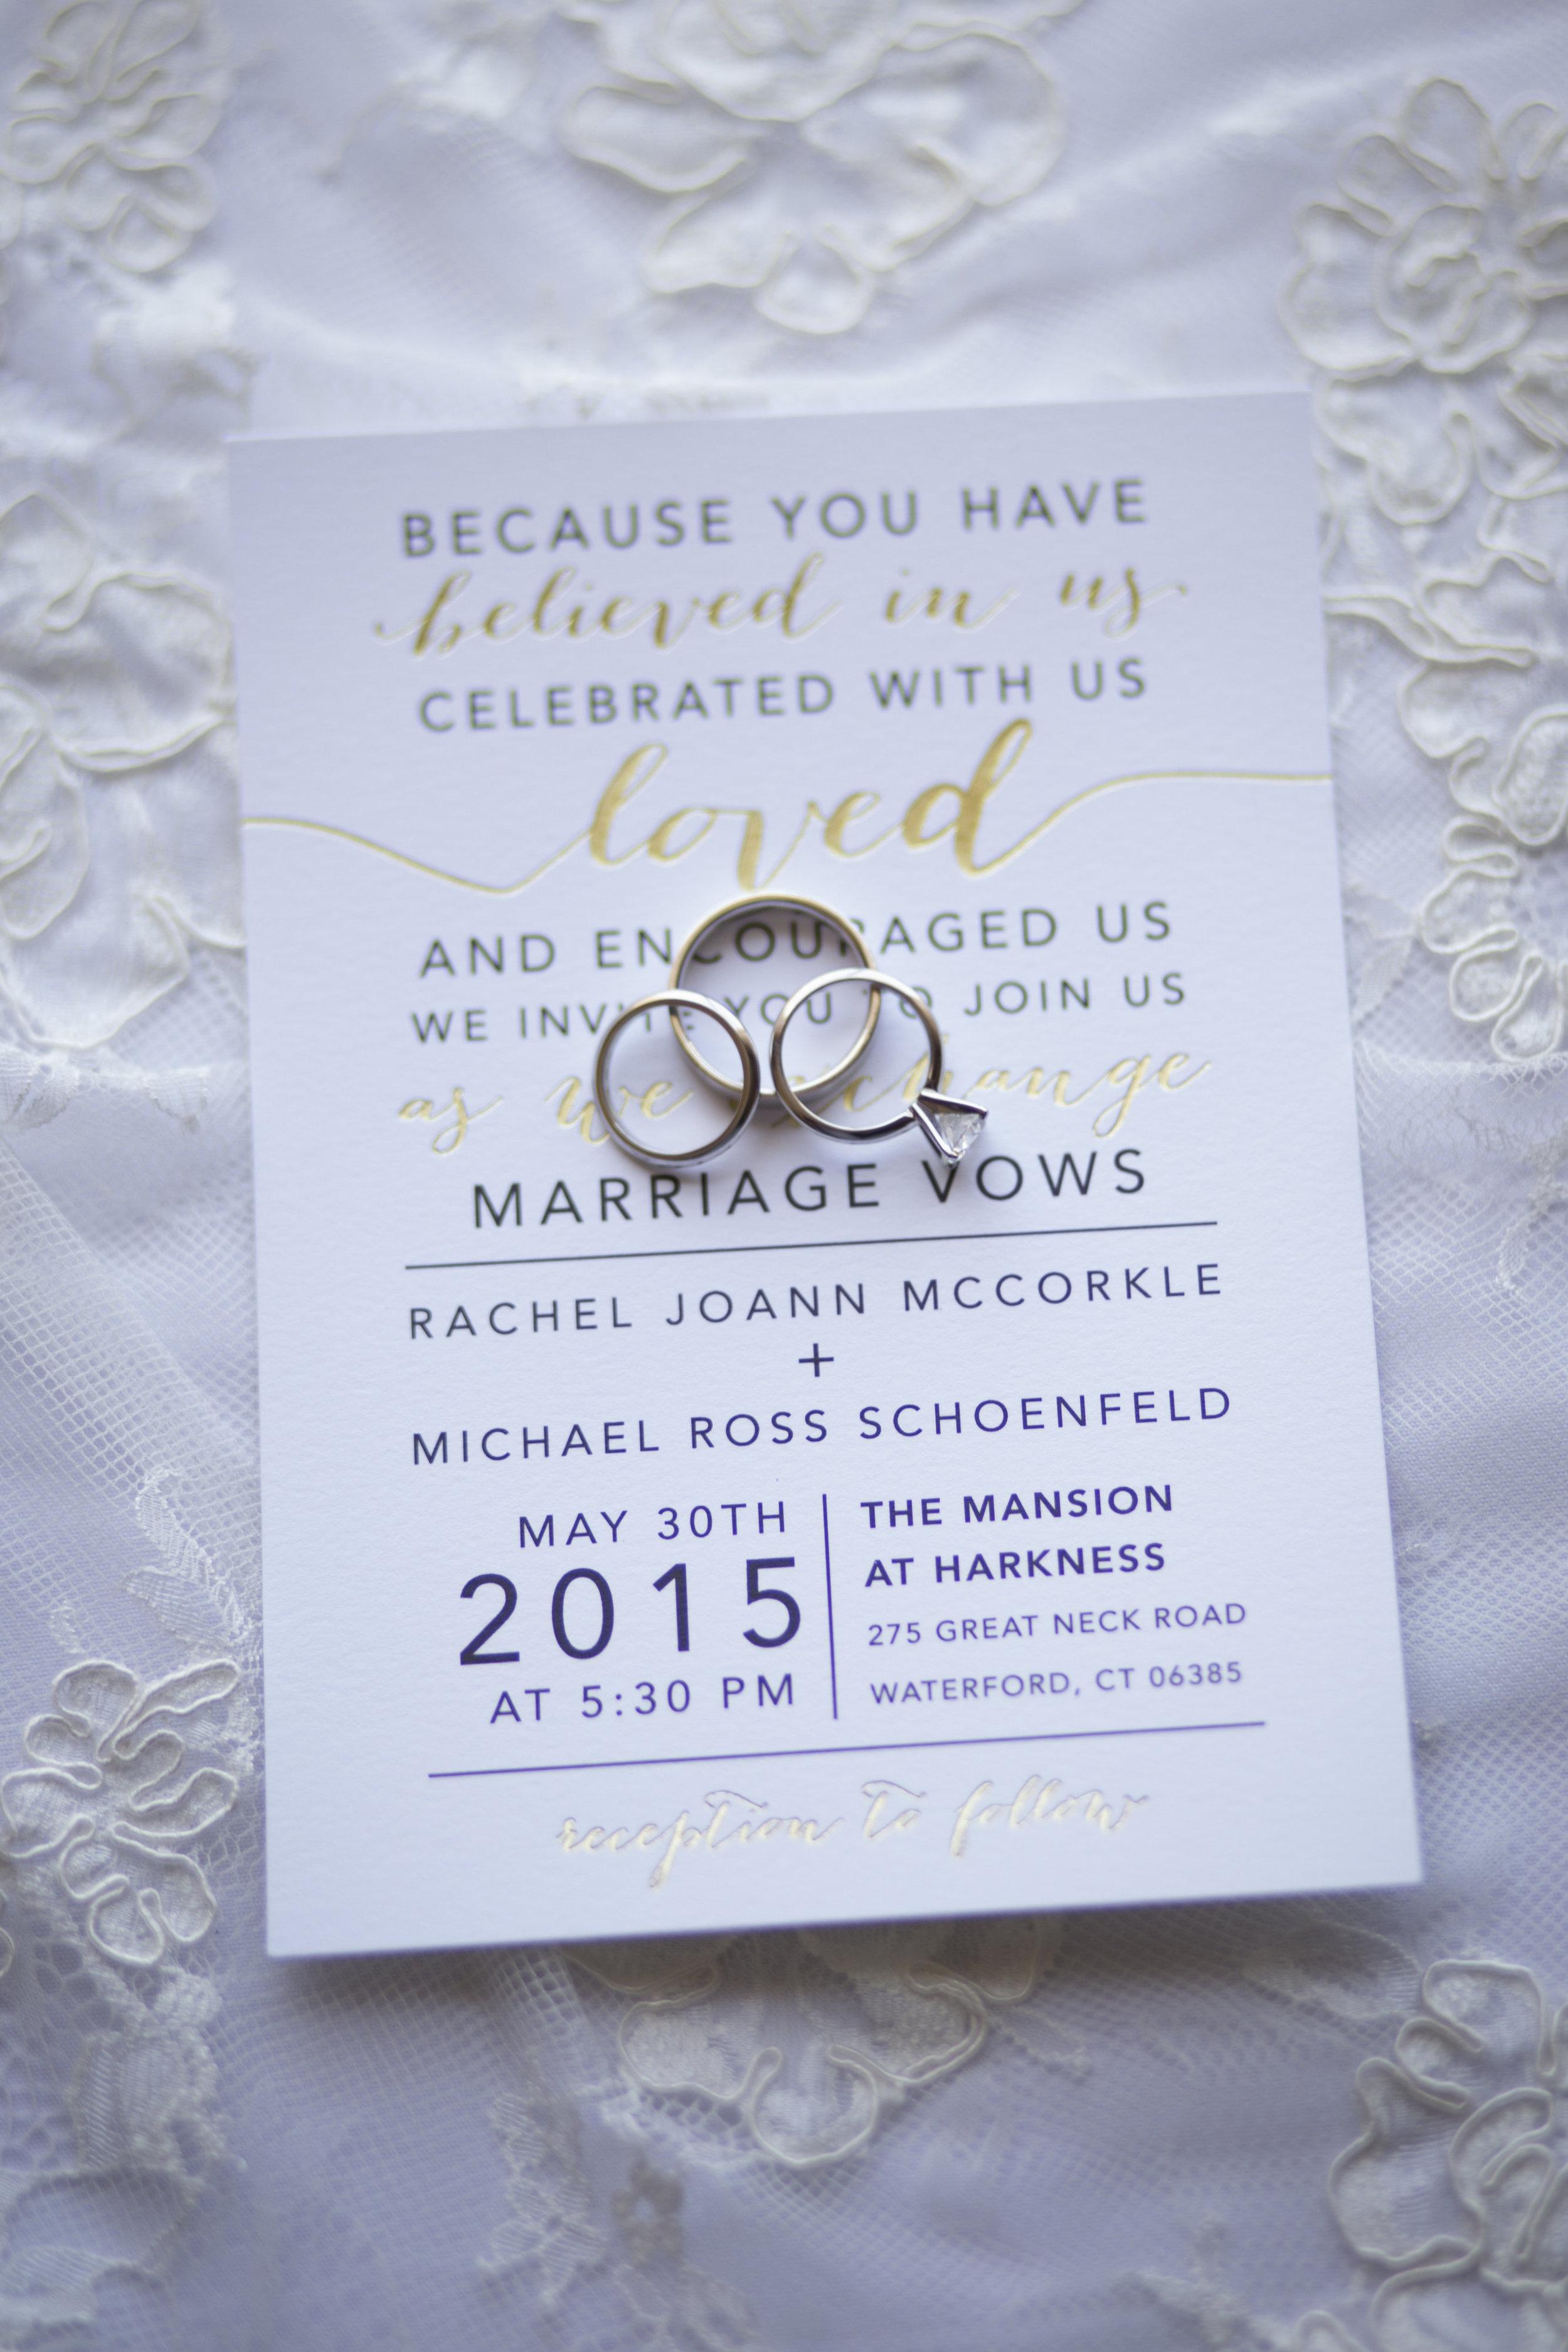 CT Wedding Eolia Mansion Amy Champagne Events Wedding Invitation, Wedding Rings